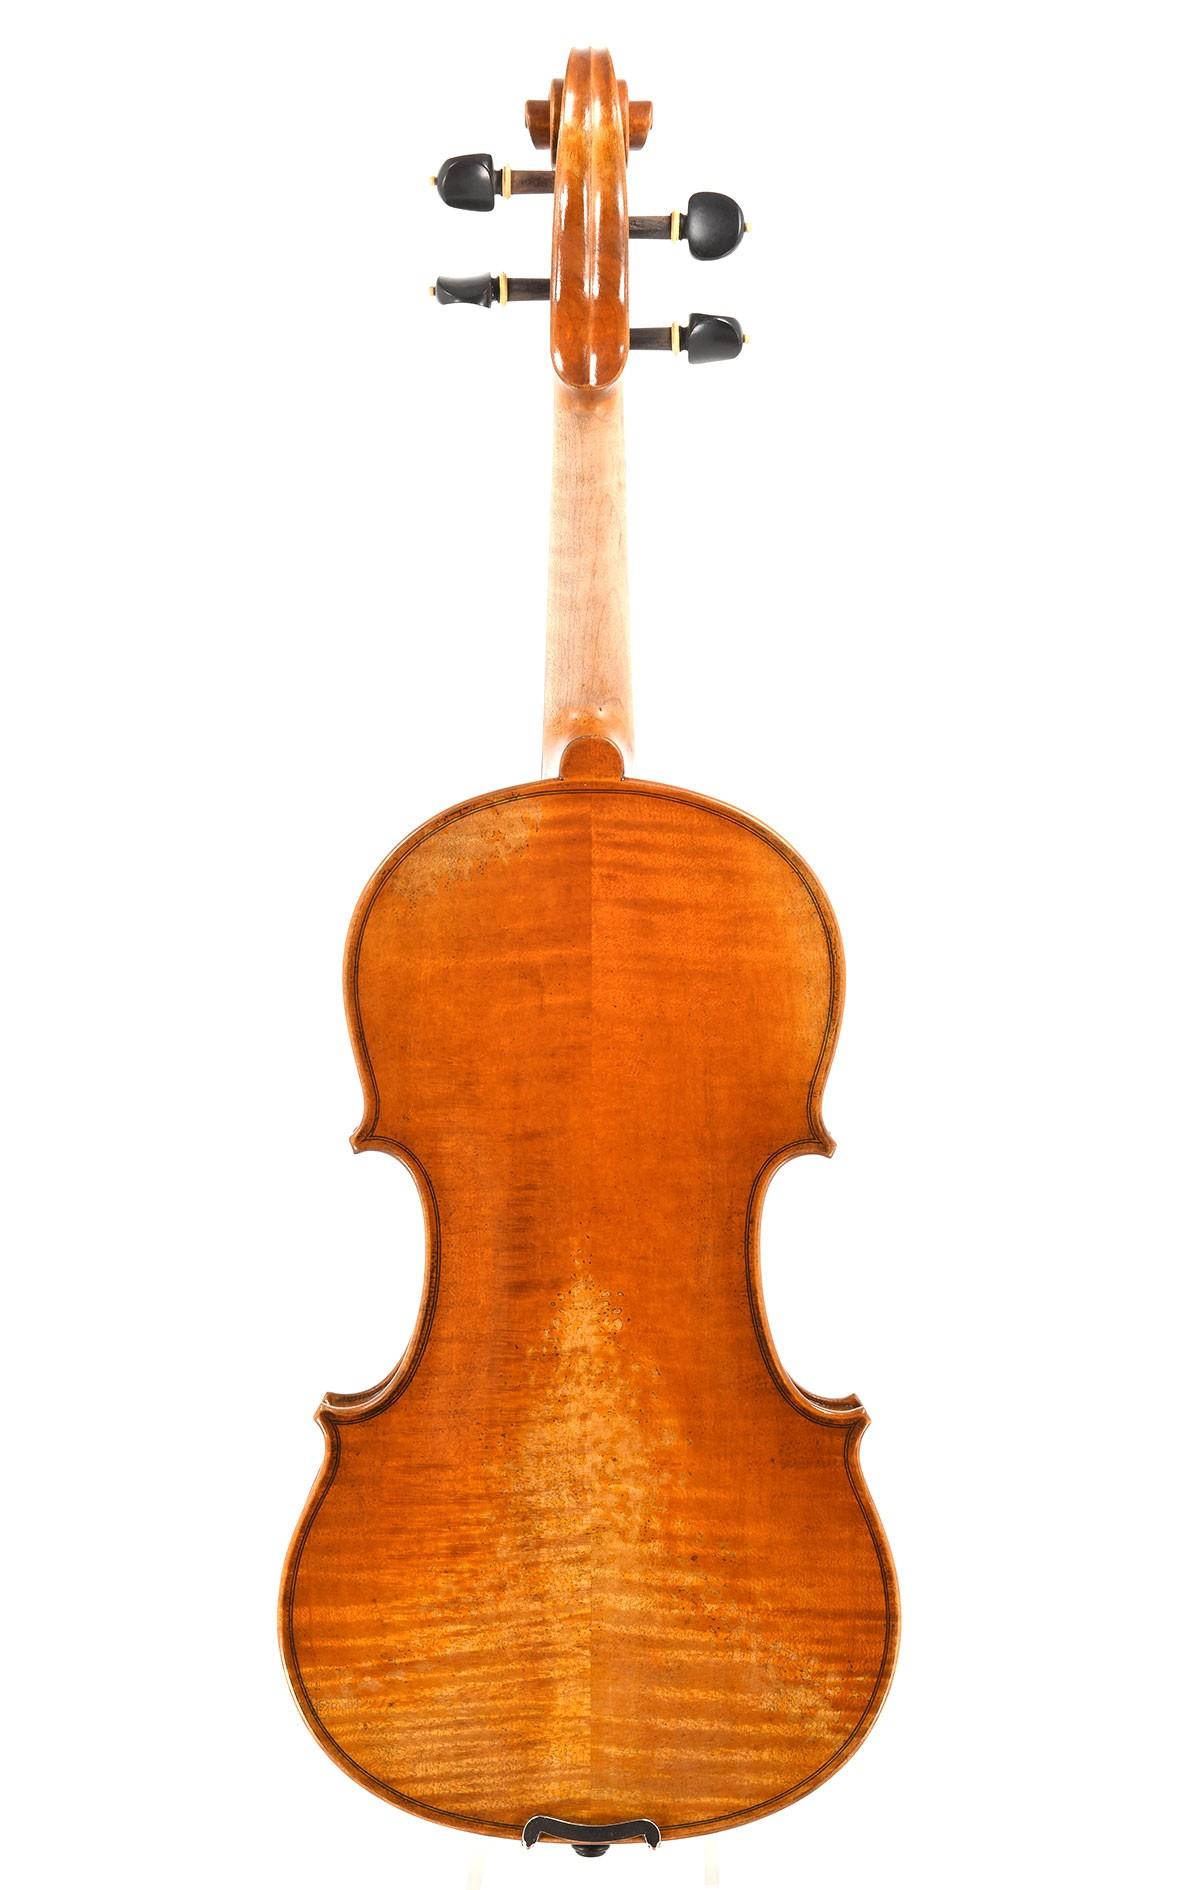 Opus 15 Guarneri